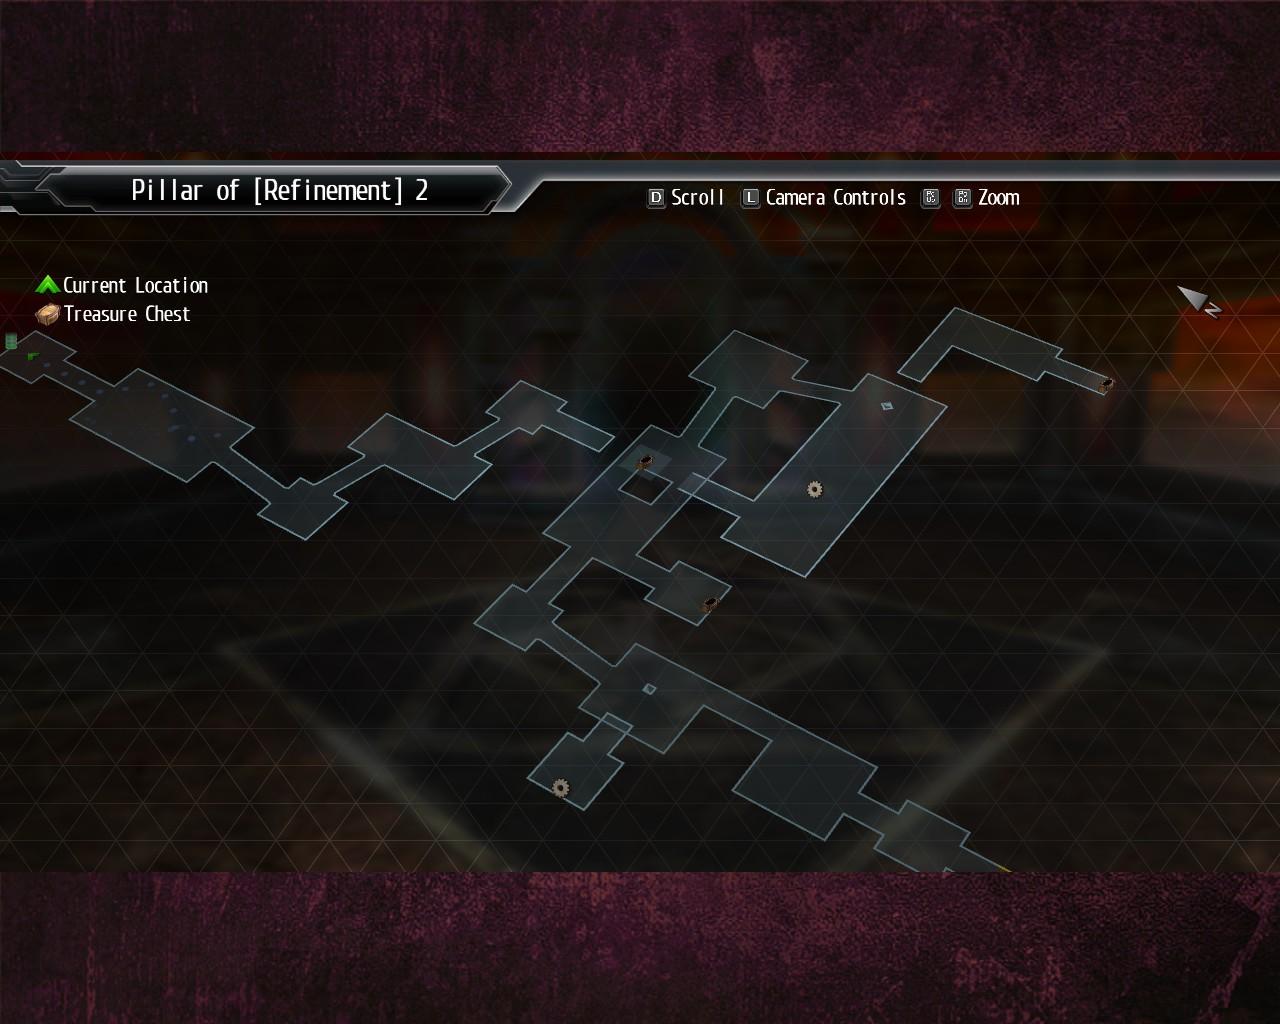 Steam Community :: Guide :: Full Walkthrough + All Achievements